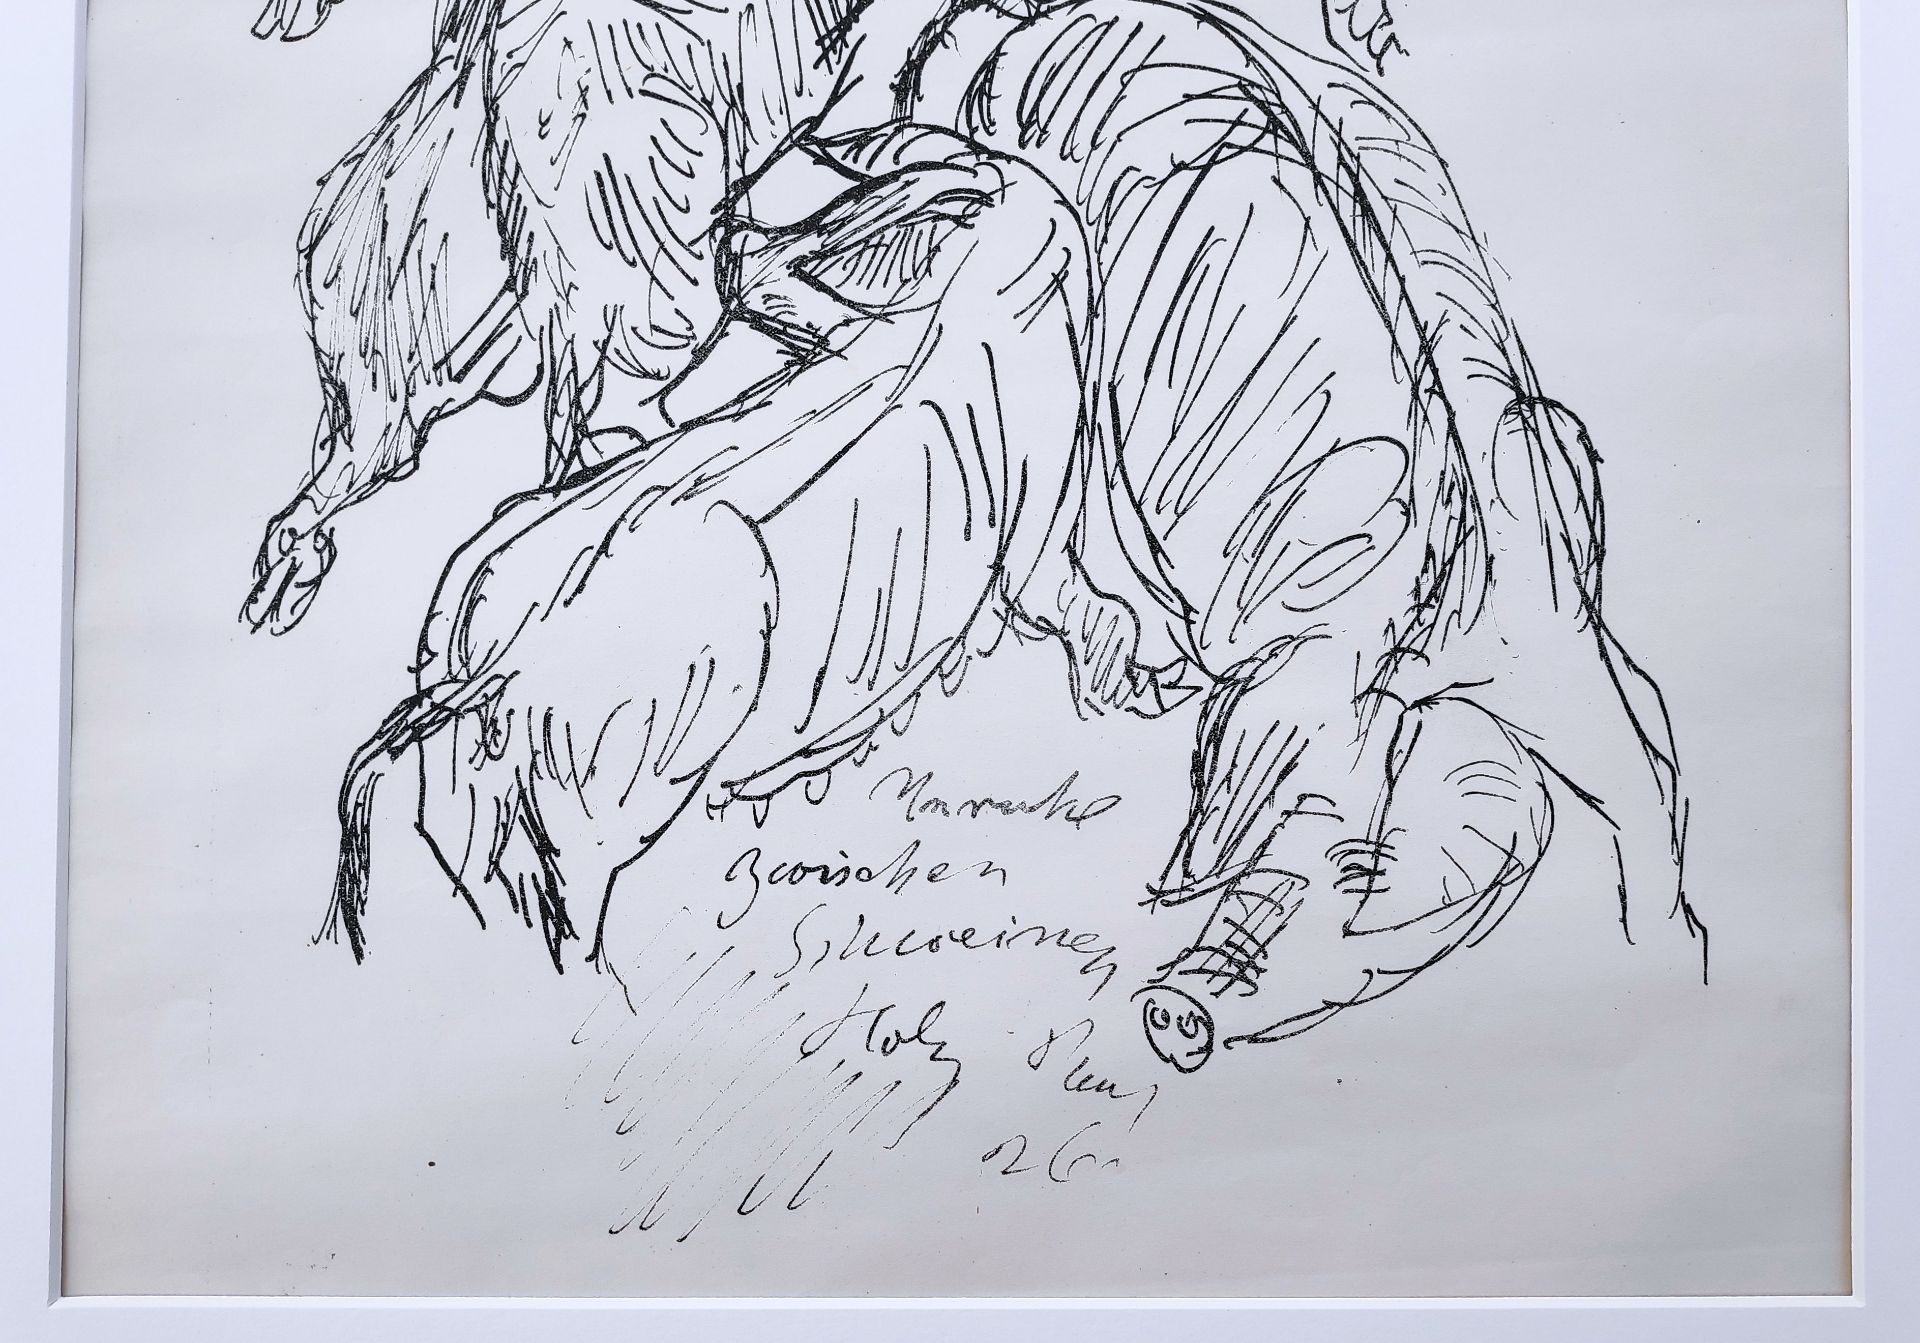 "Holz, Paul (1883 Riesenbrück bei Pasewalk - 1938 Schleswig) ""Unruhe unter Schweinen"" - Bild 3 aus 3"